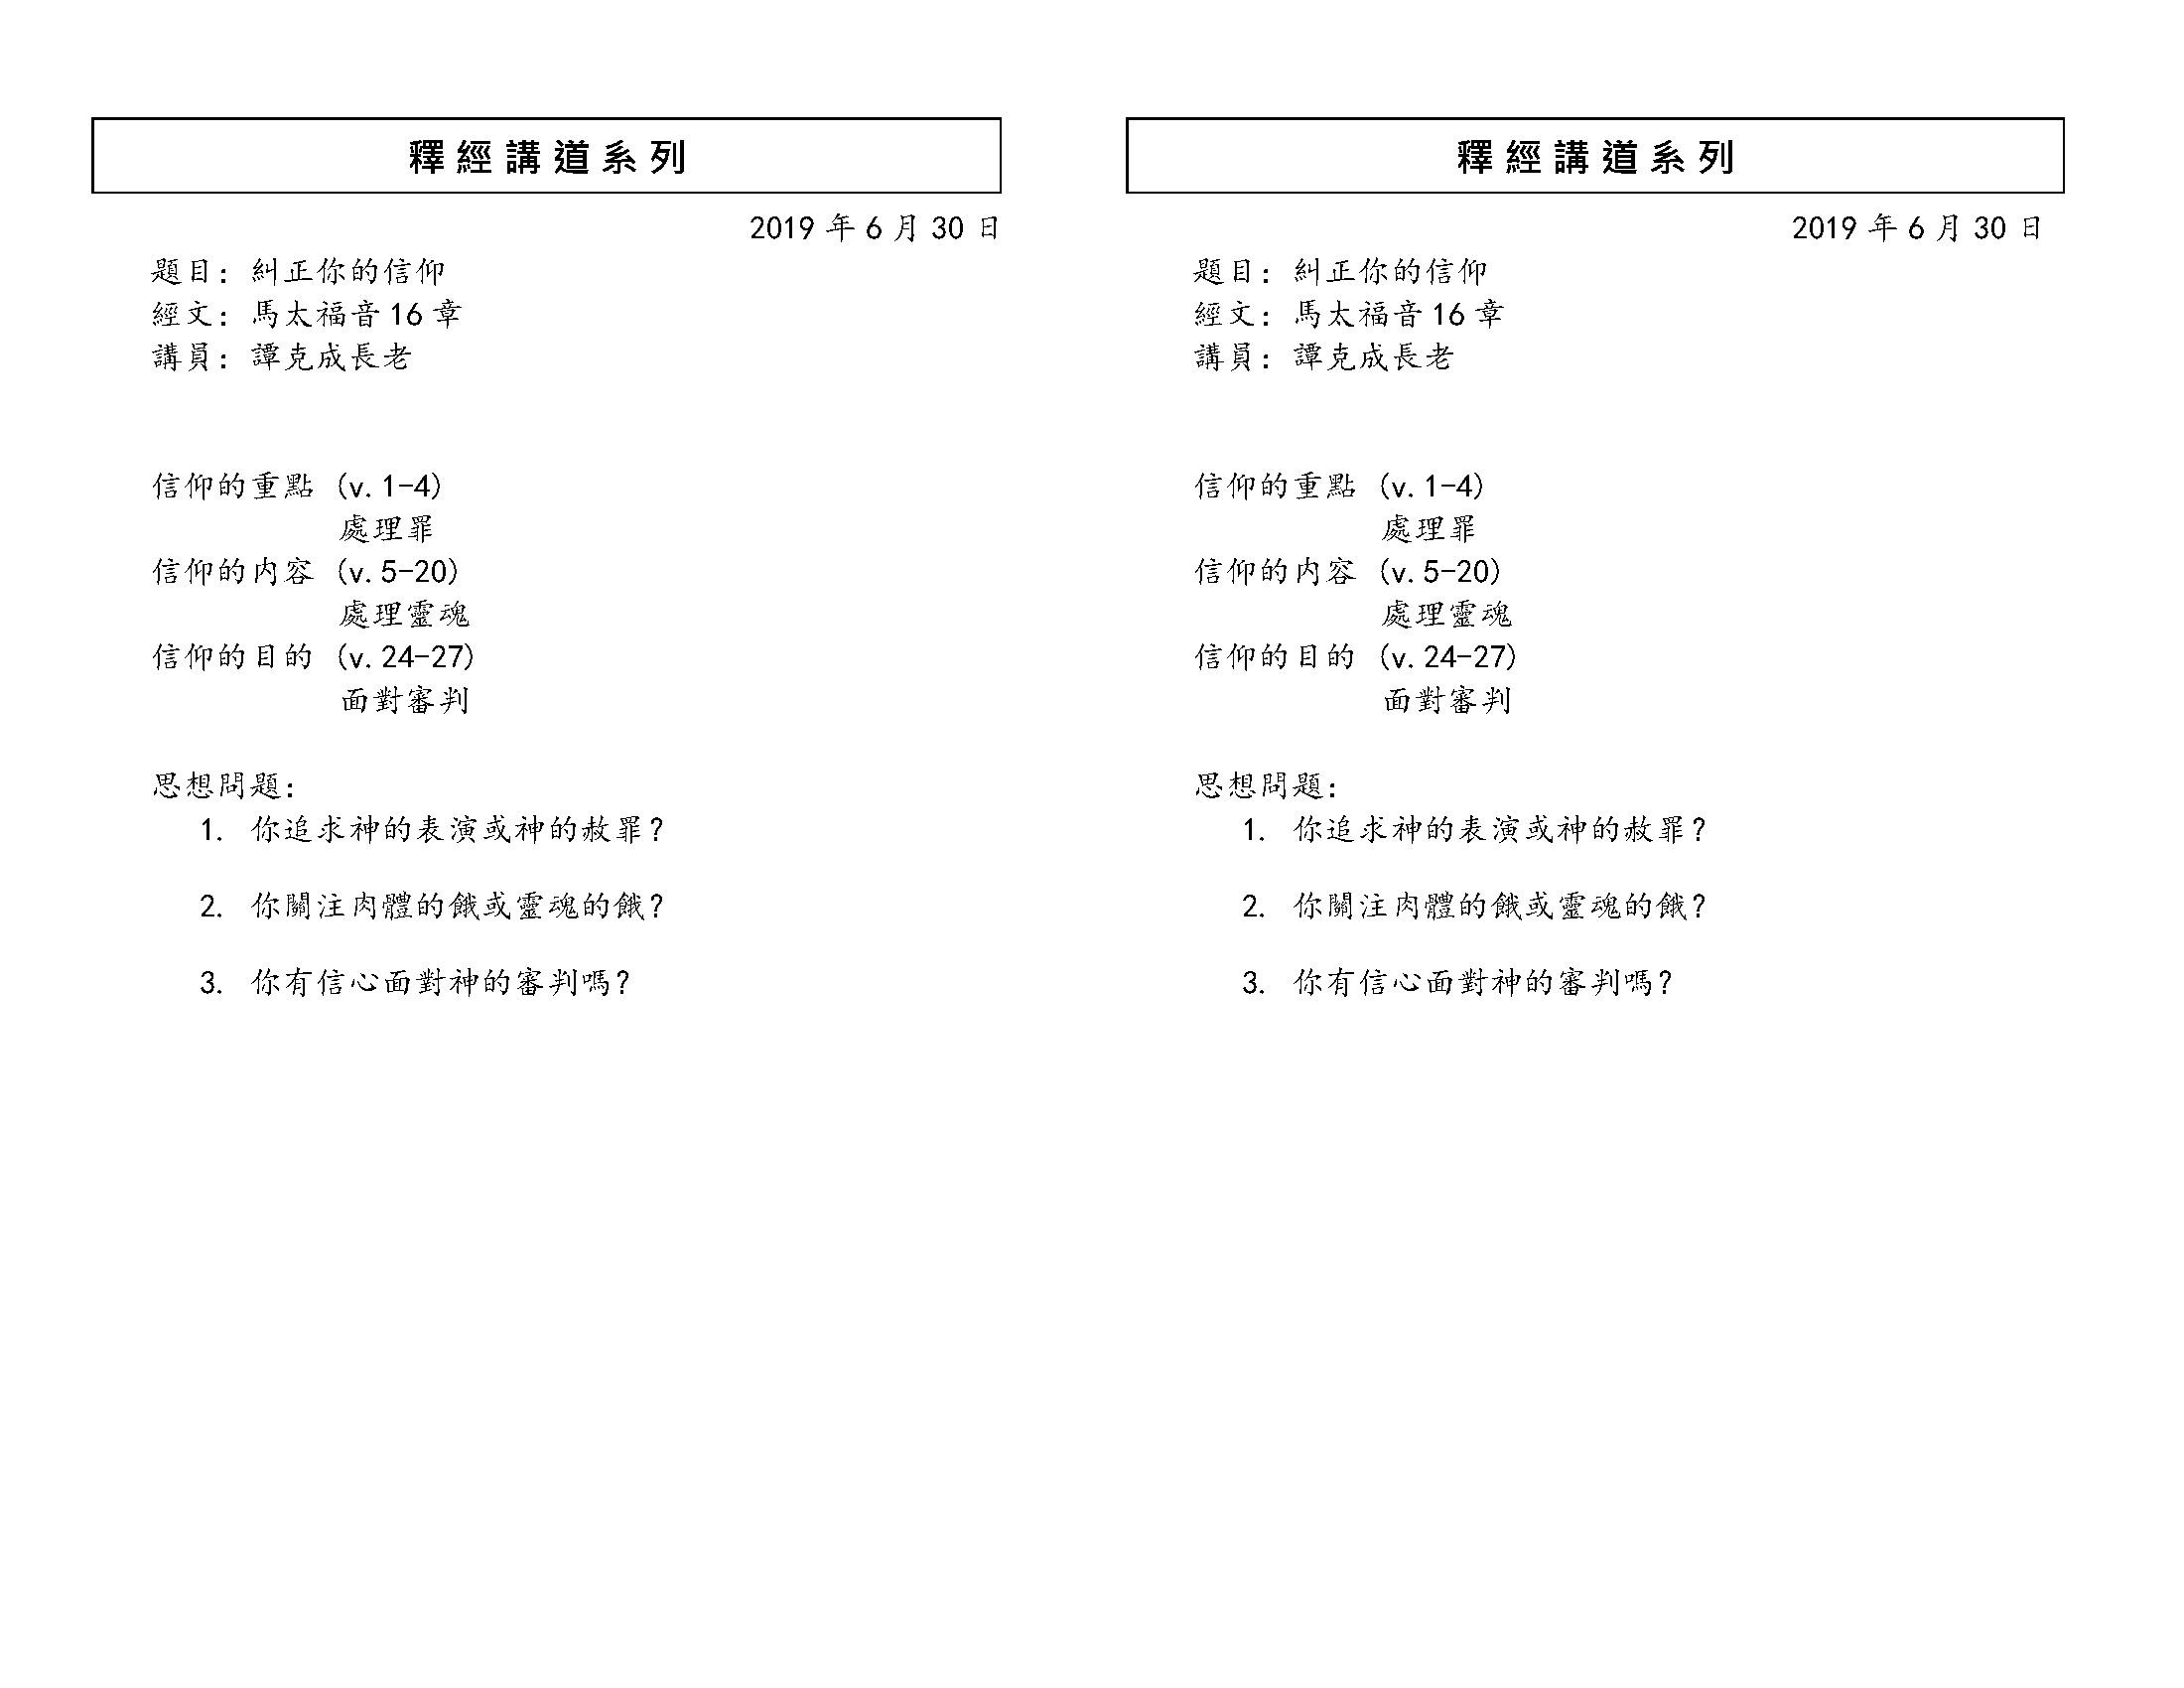 Chinese Bulletin 2019-6-30_Page_3.jpg